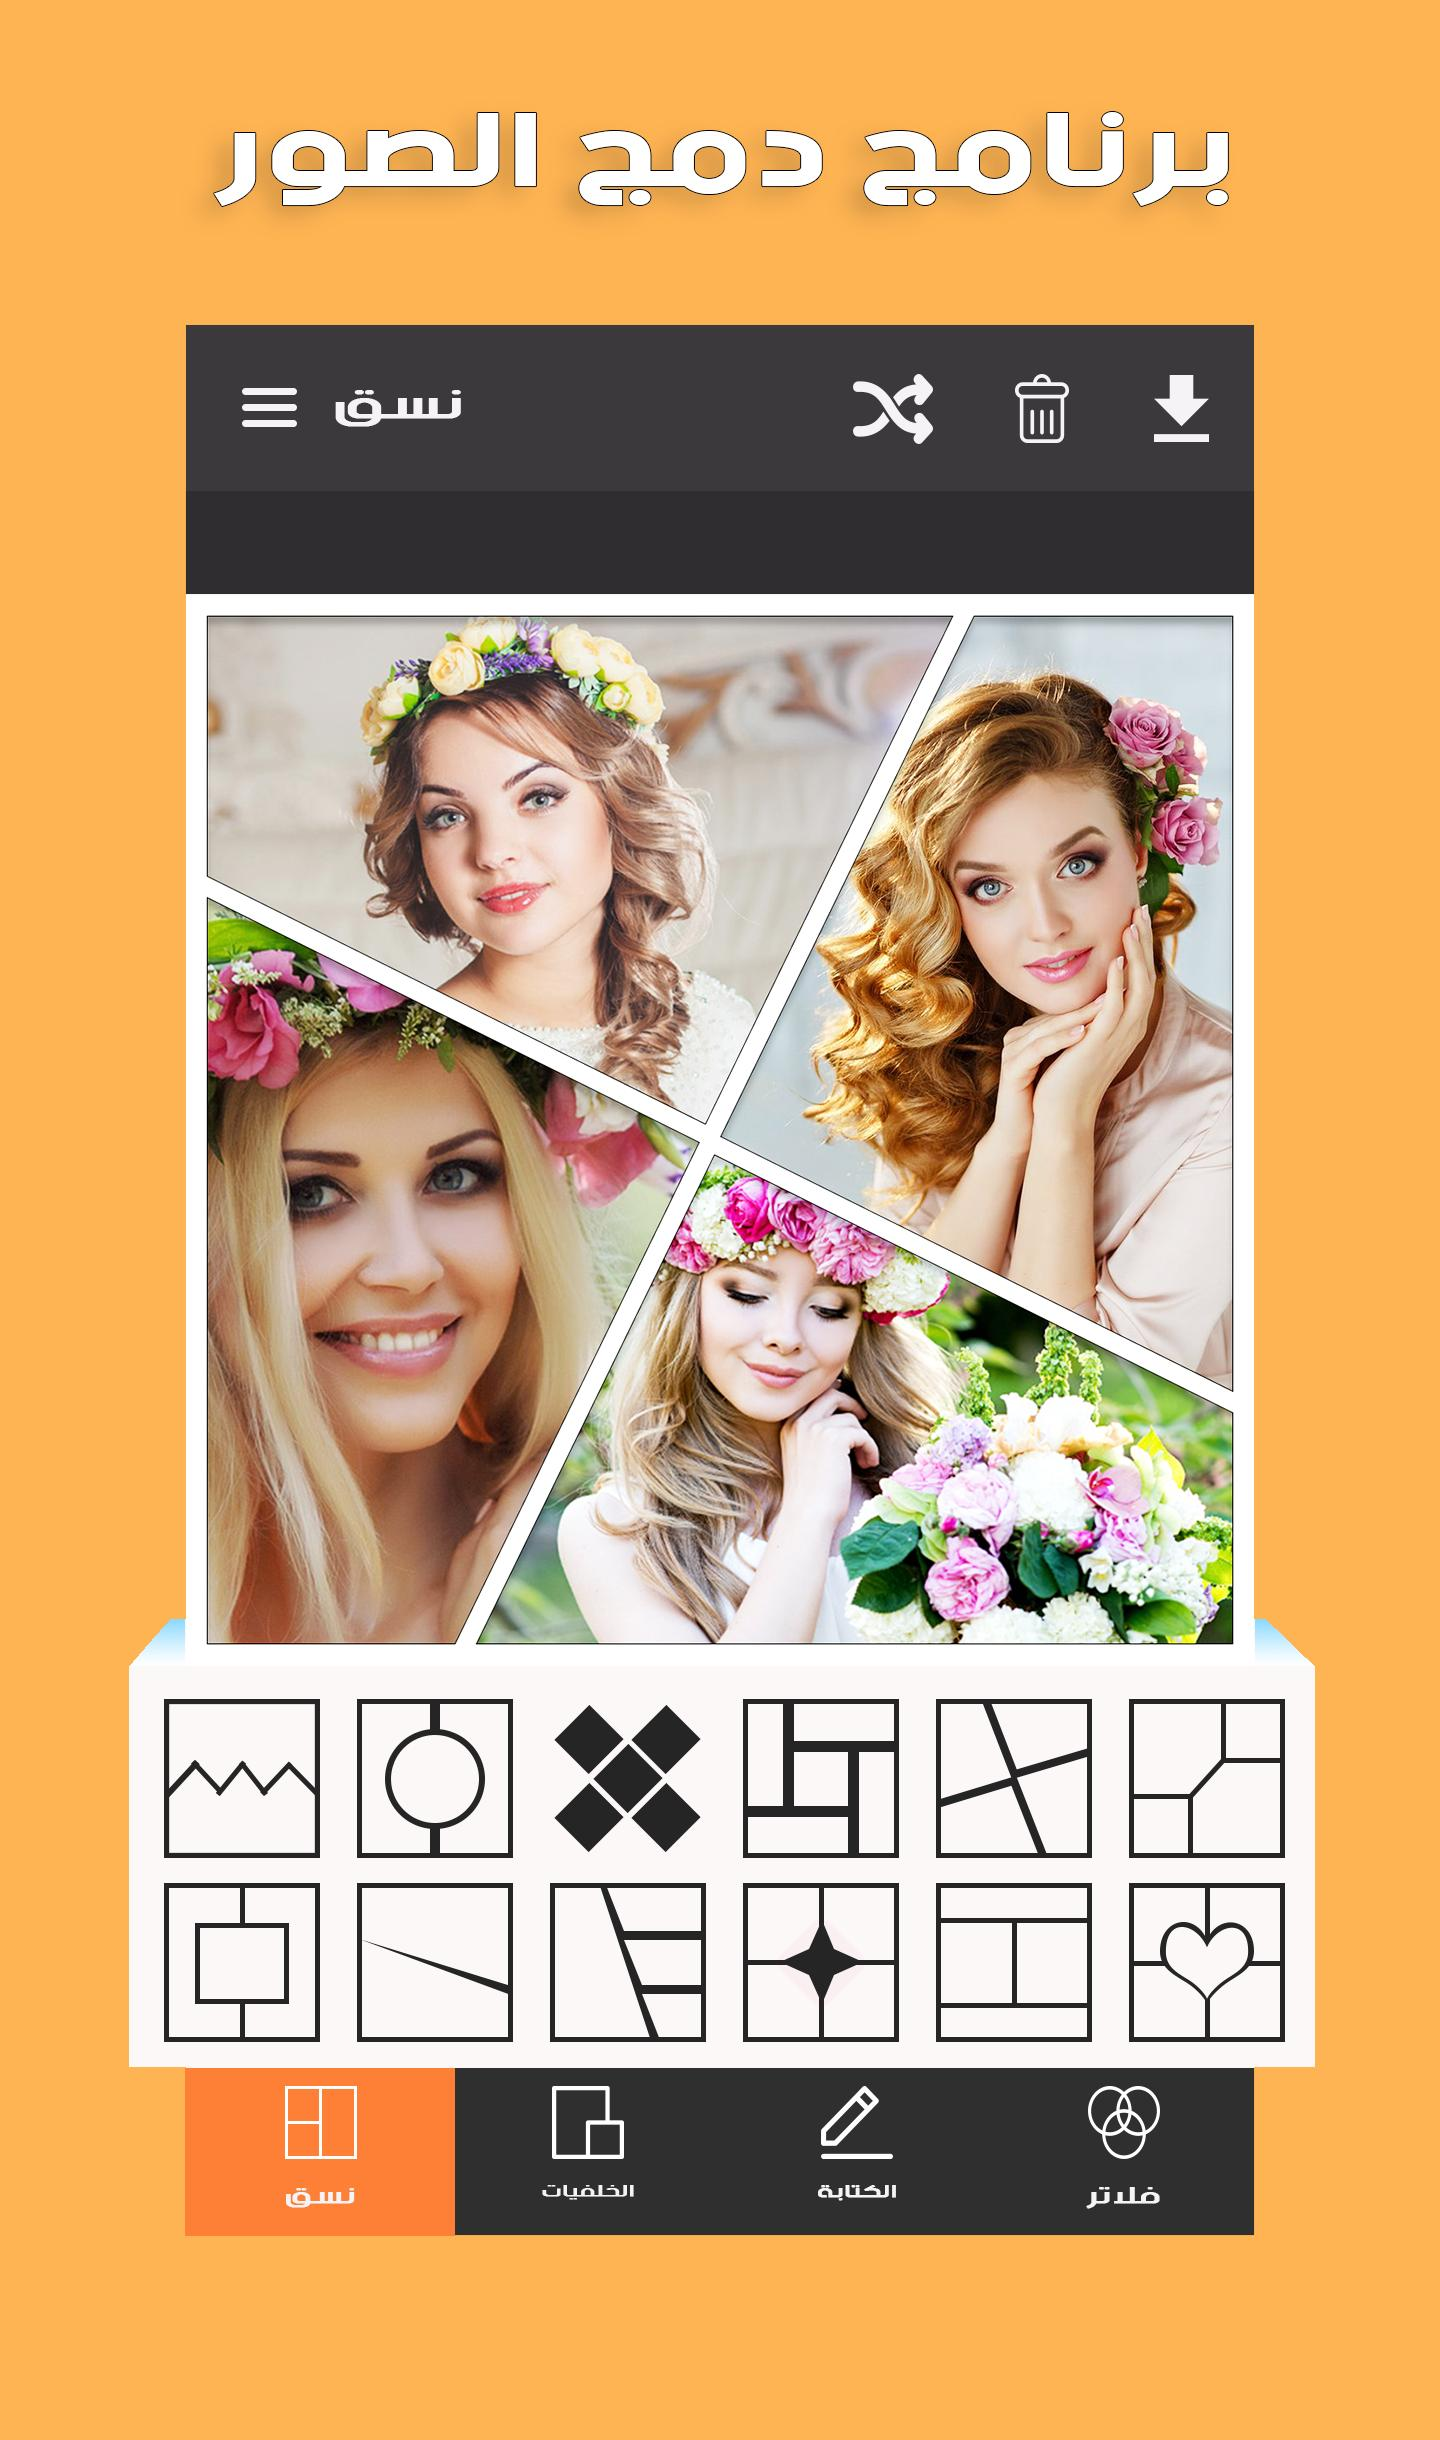 برنامج دمج الصور جديد 2018 For Android Apk Download